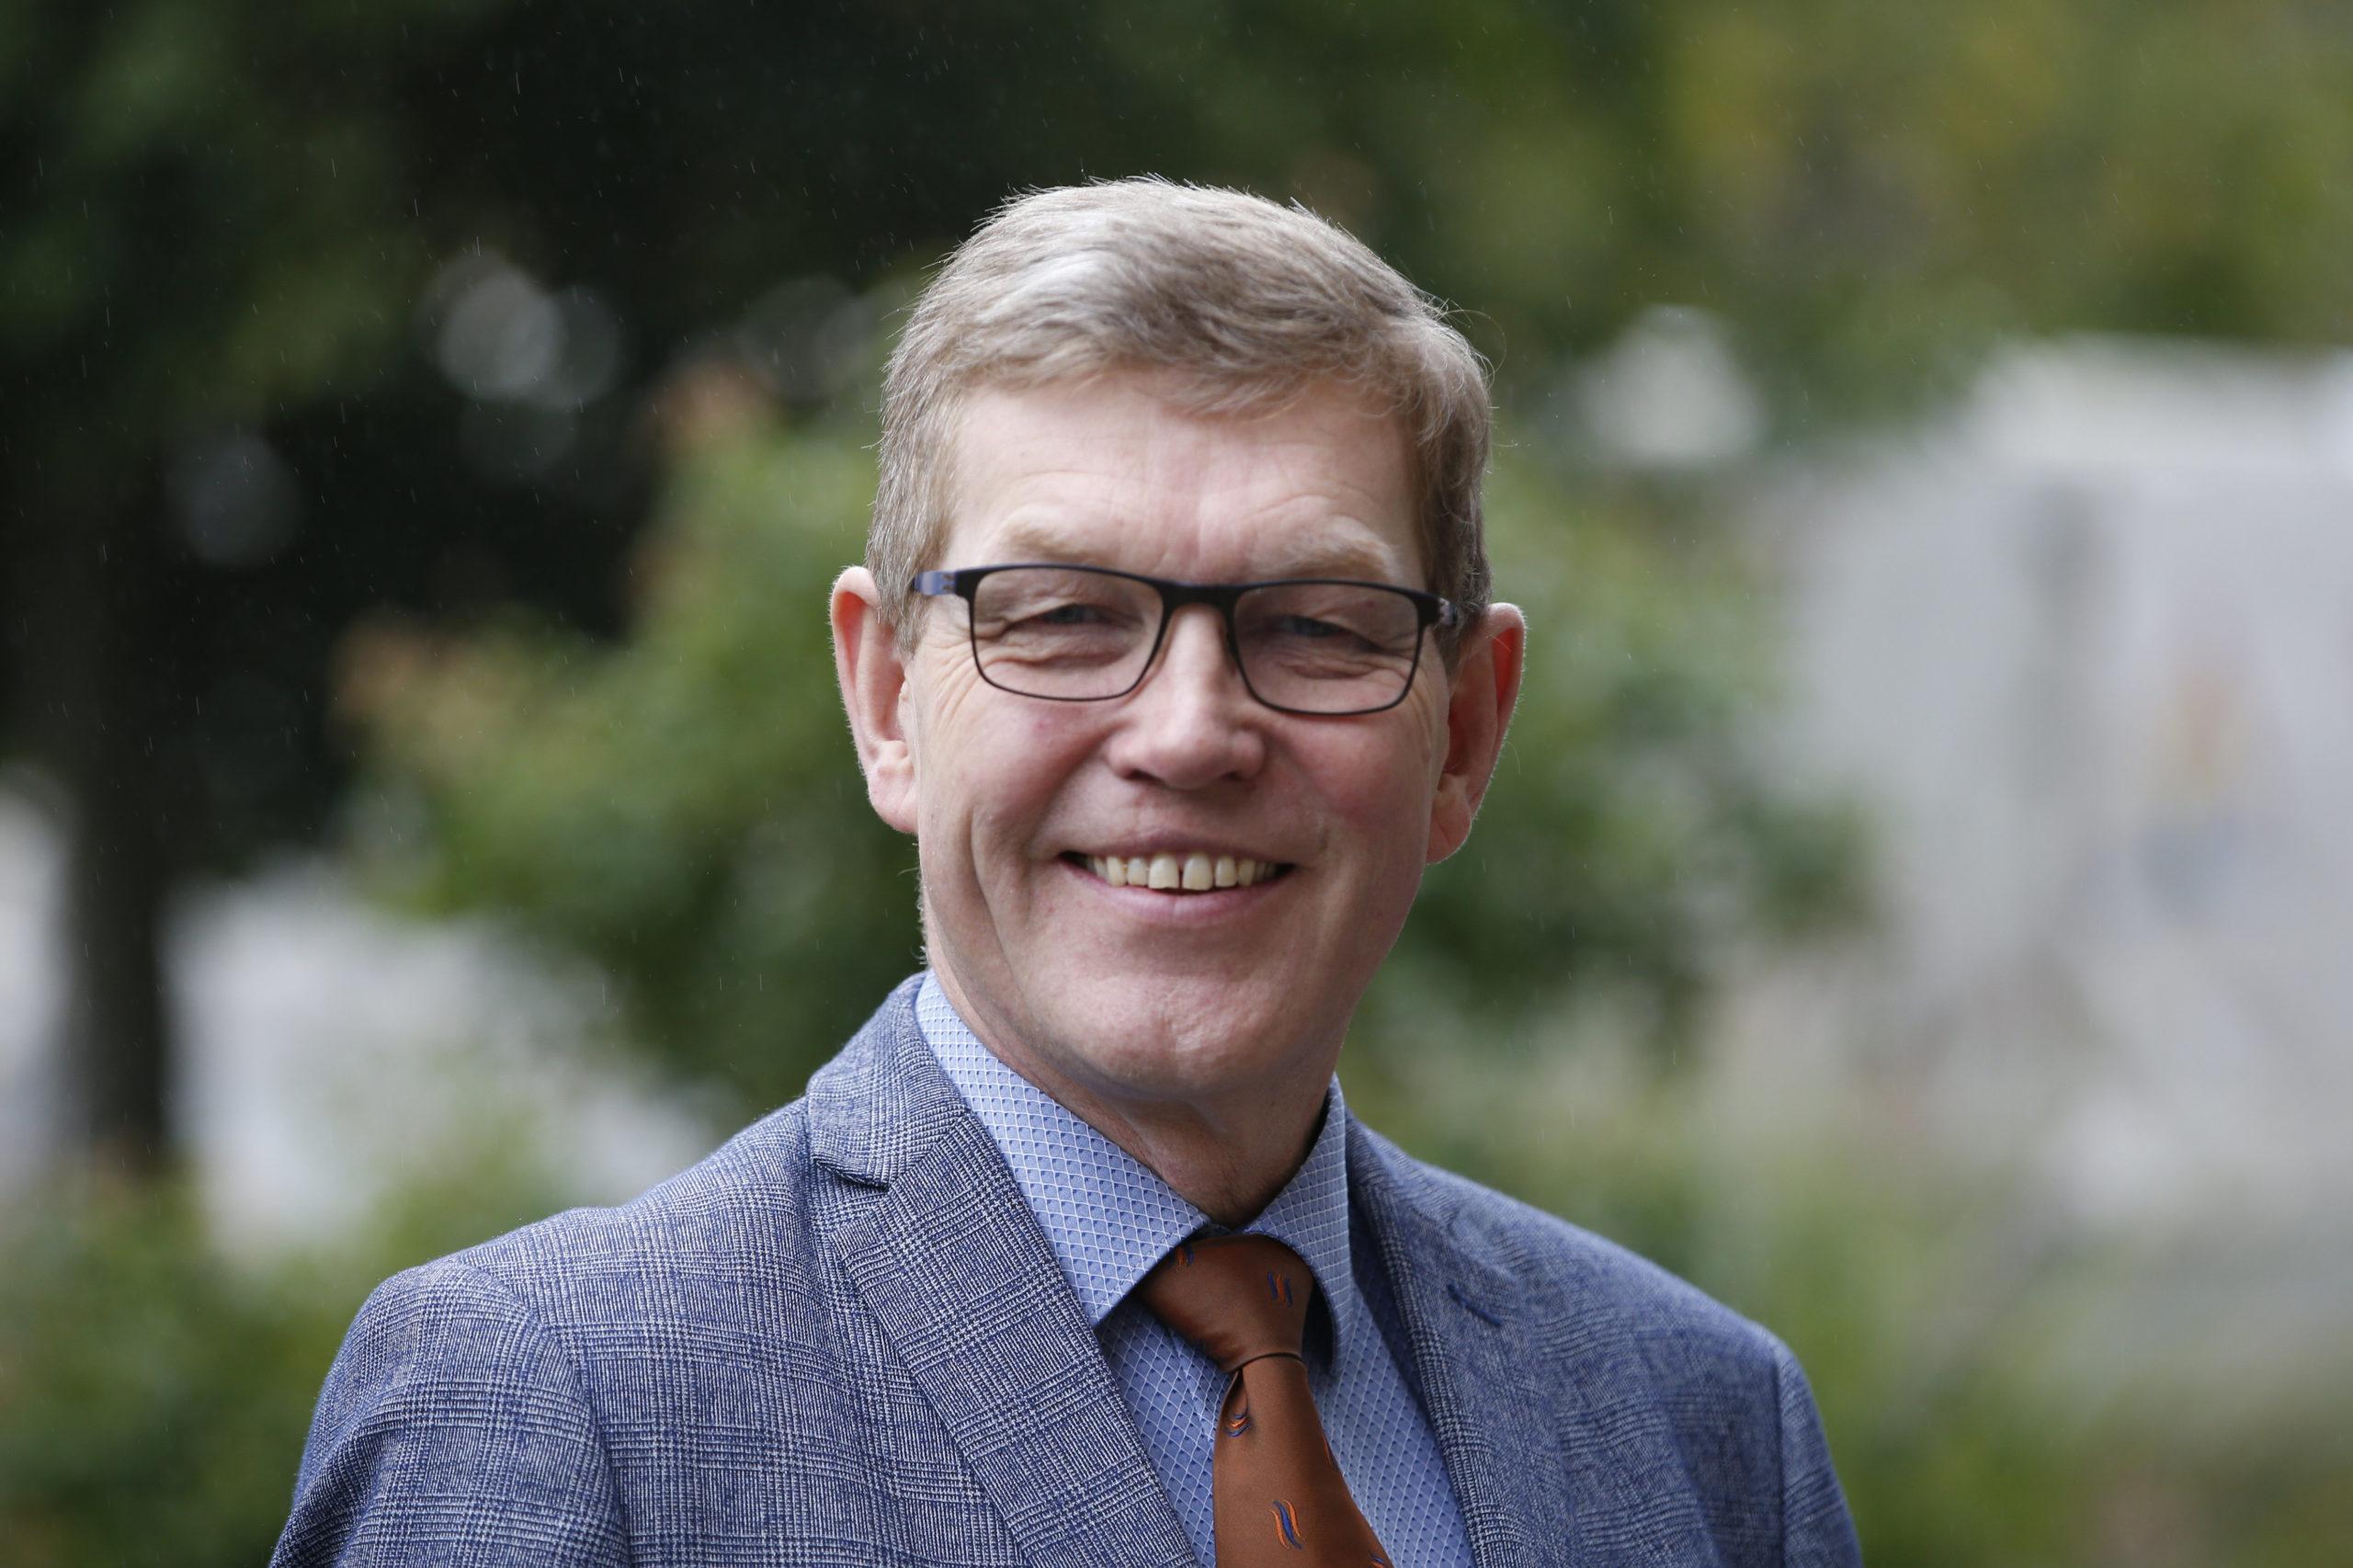 Dekan Dr. Martin Fedler-Raupp